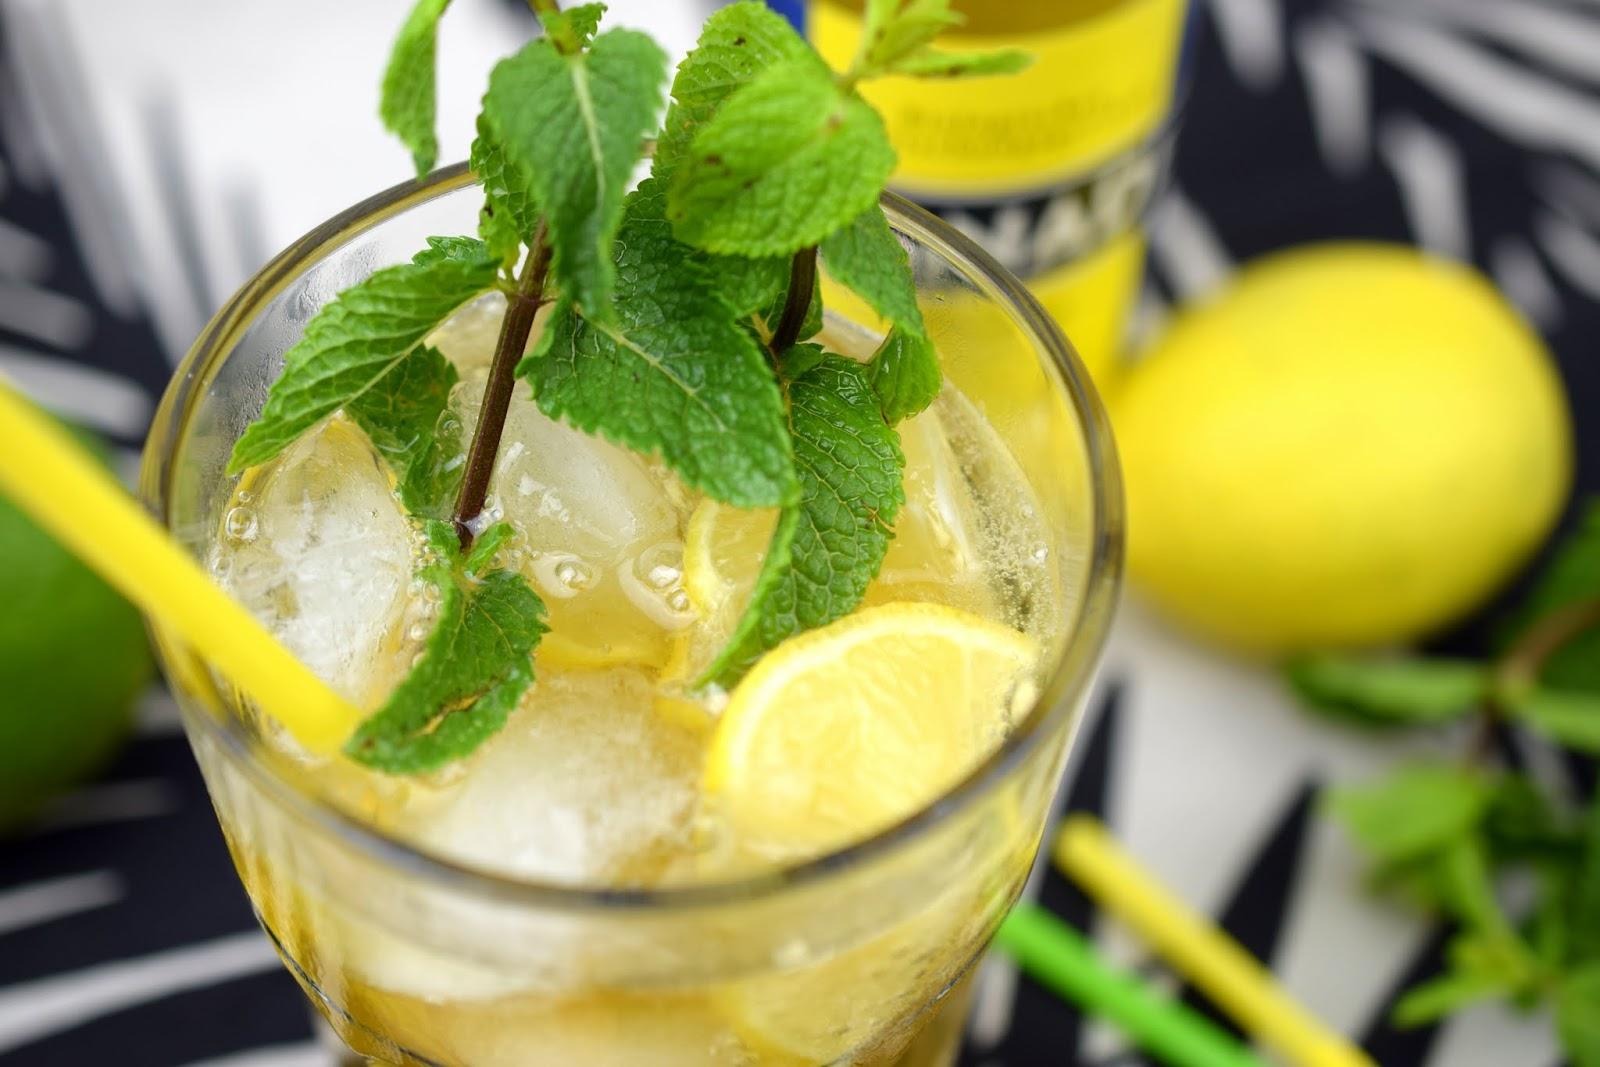 Rezept: Limorinha mit Bionade Zitrone-Bergamotte